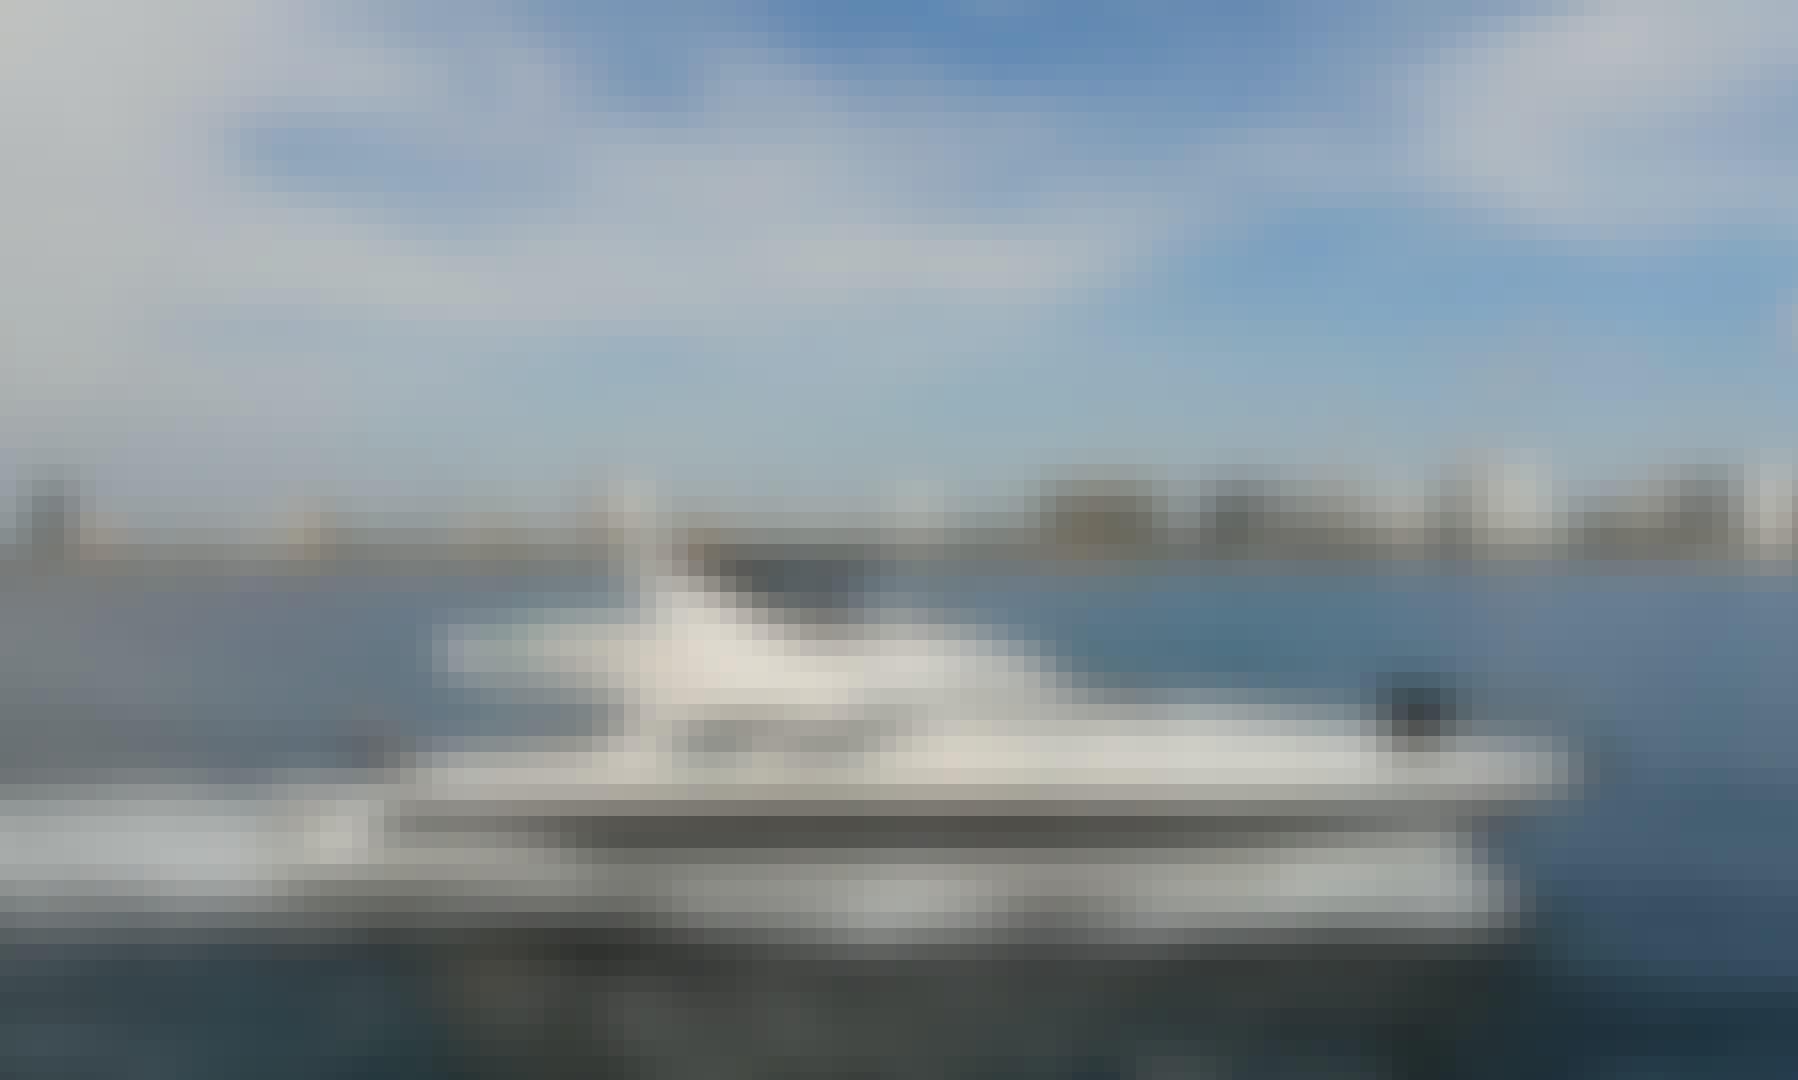 2008 Azimut Motor Yacht Charter in Miami Beach, Florida